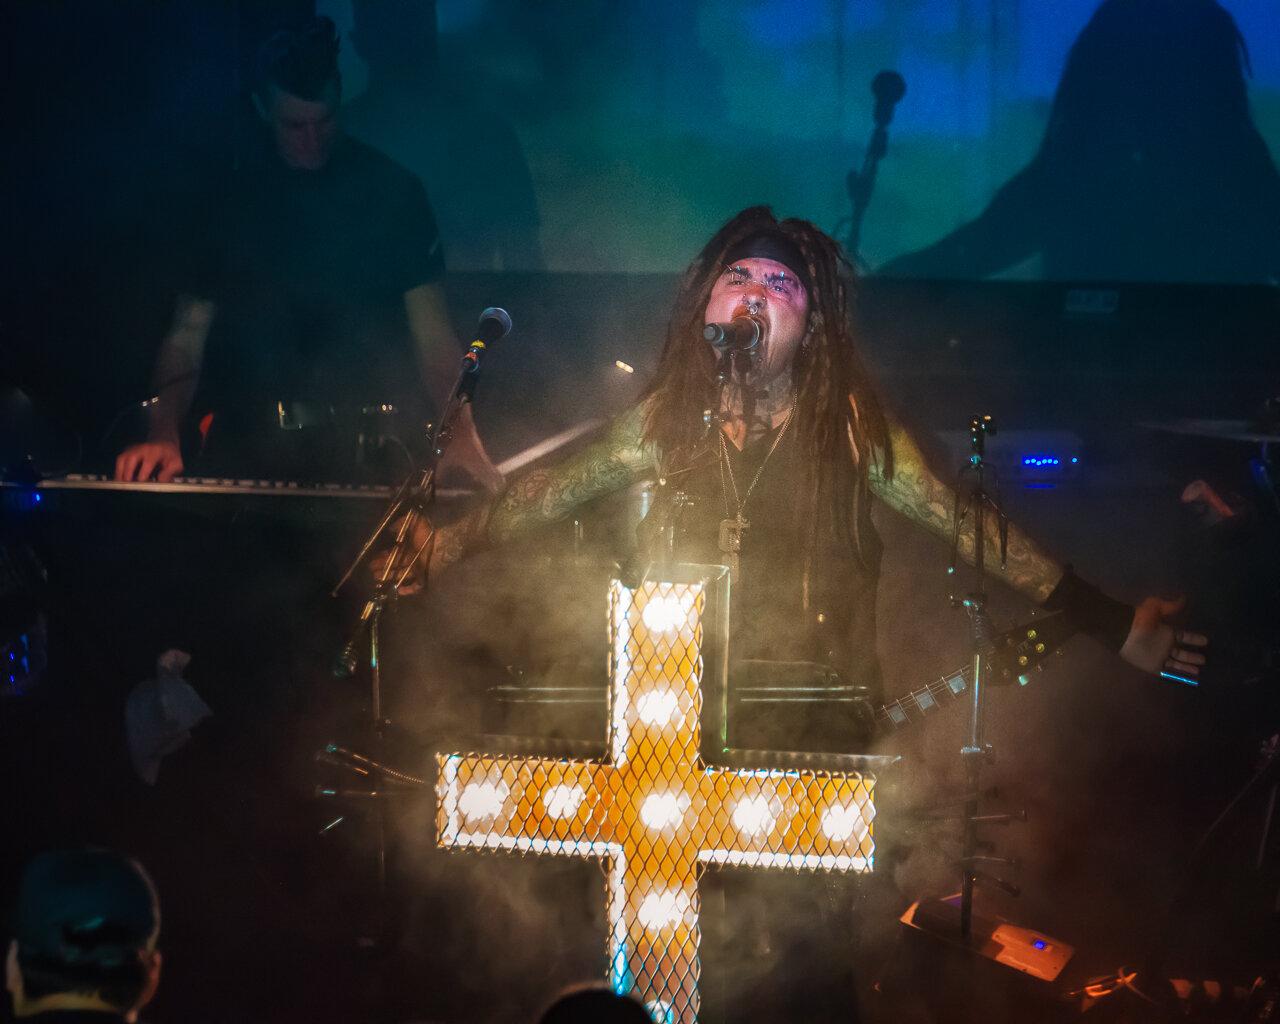 Ministry-VinylMusicHall-Pensacola-Nov012019-Raymer-009.jpg